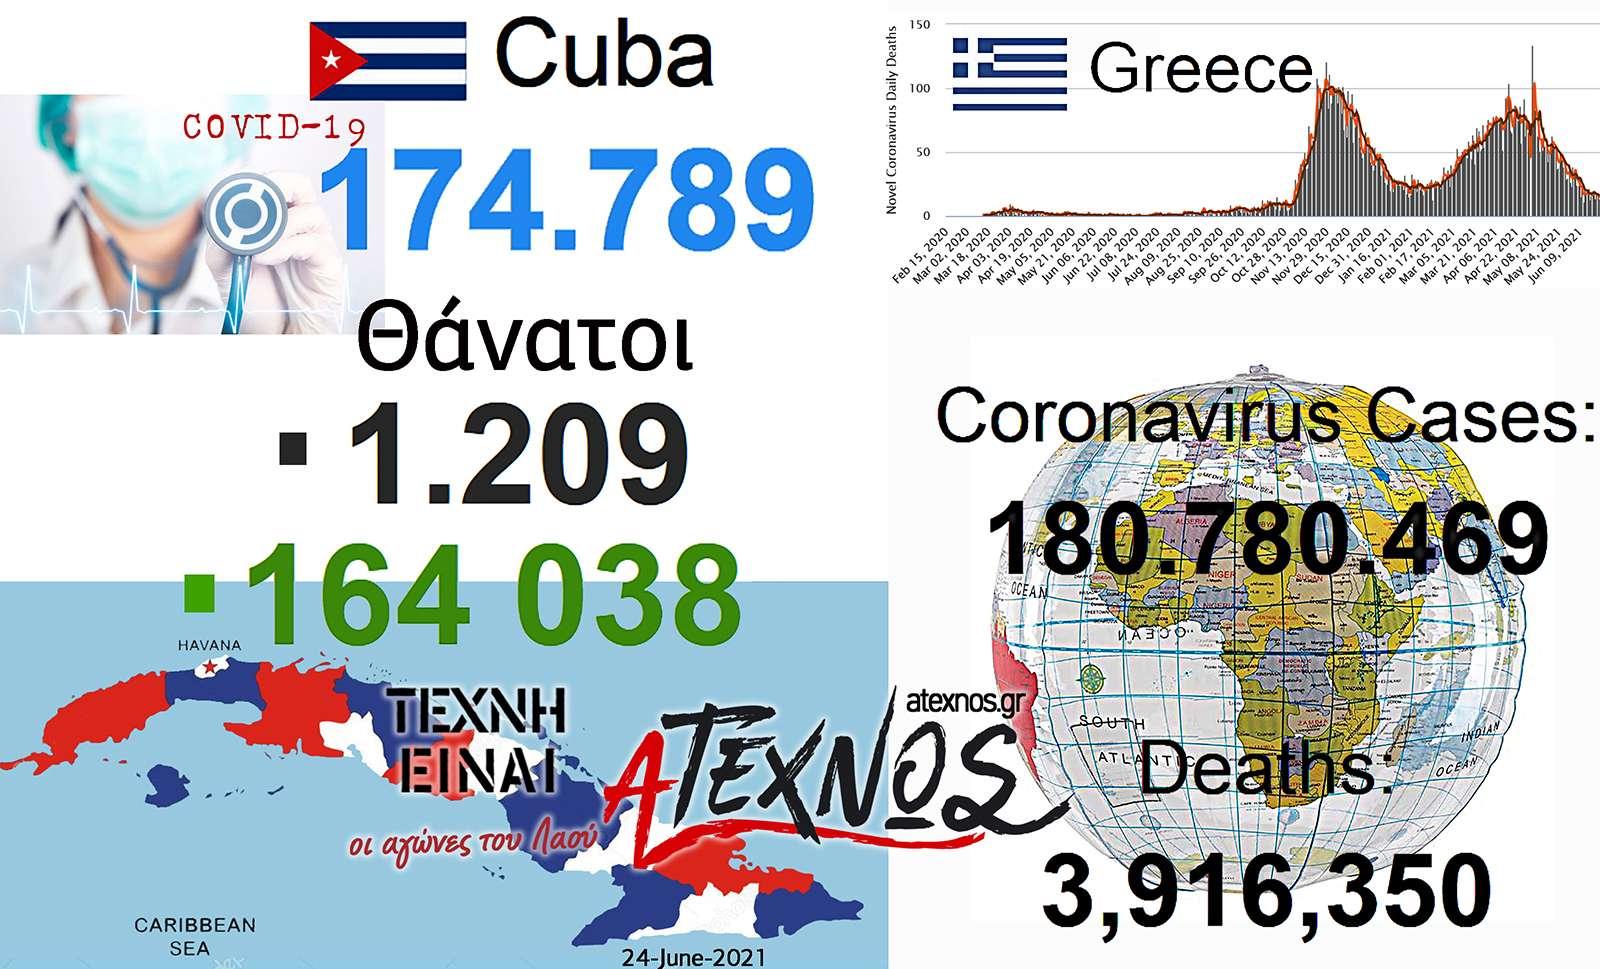 Cuba 24 June 2021 Covid Ατέχνως